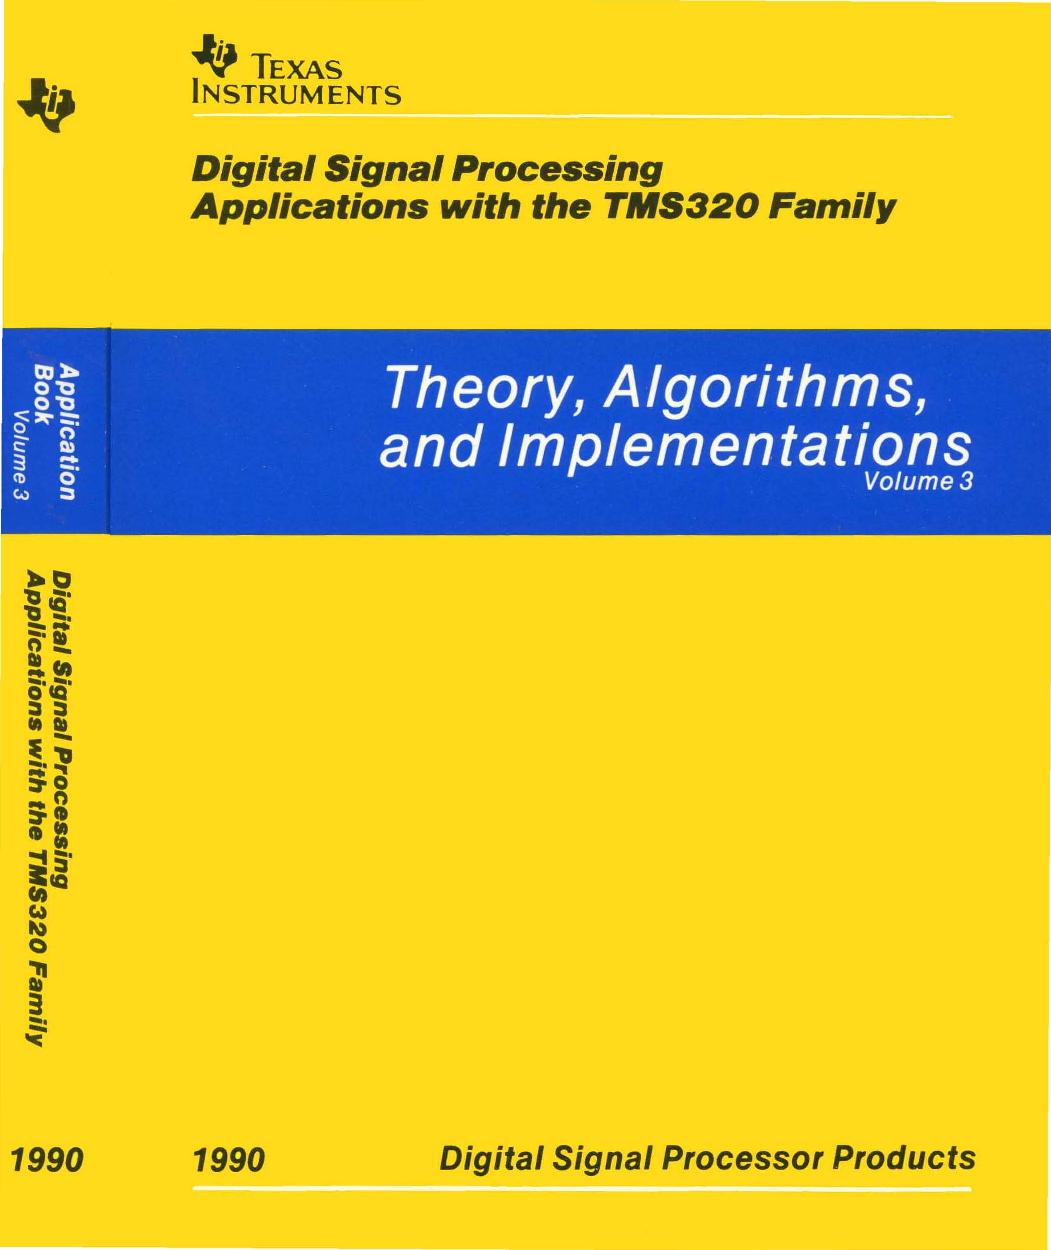 1990_TI_DSP_Applications_Vol_3 1990 TI DSP Applications Vol 3